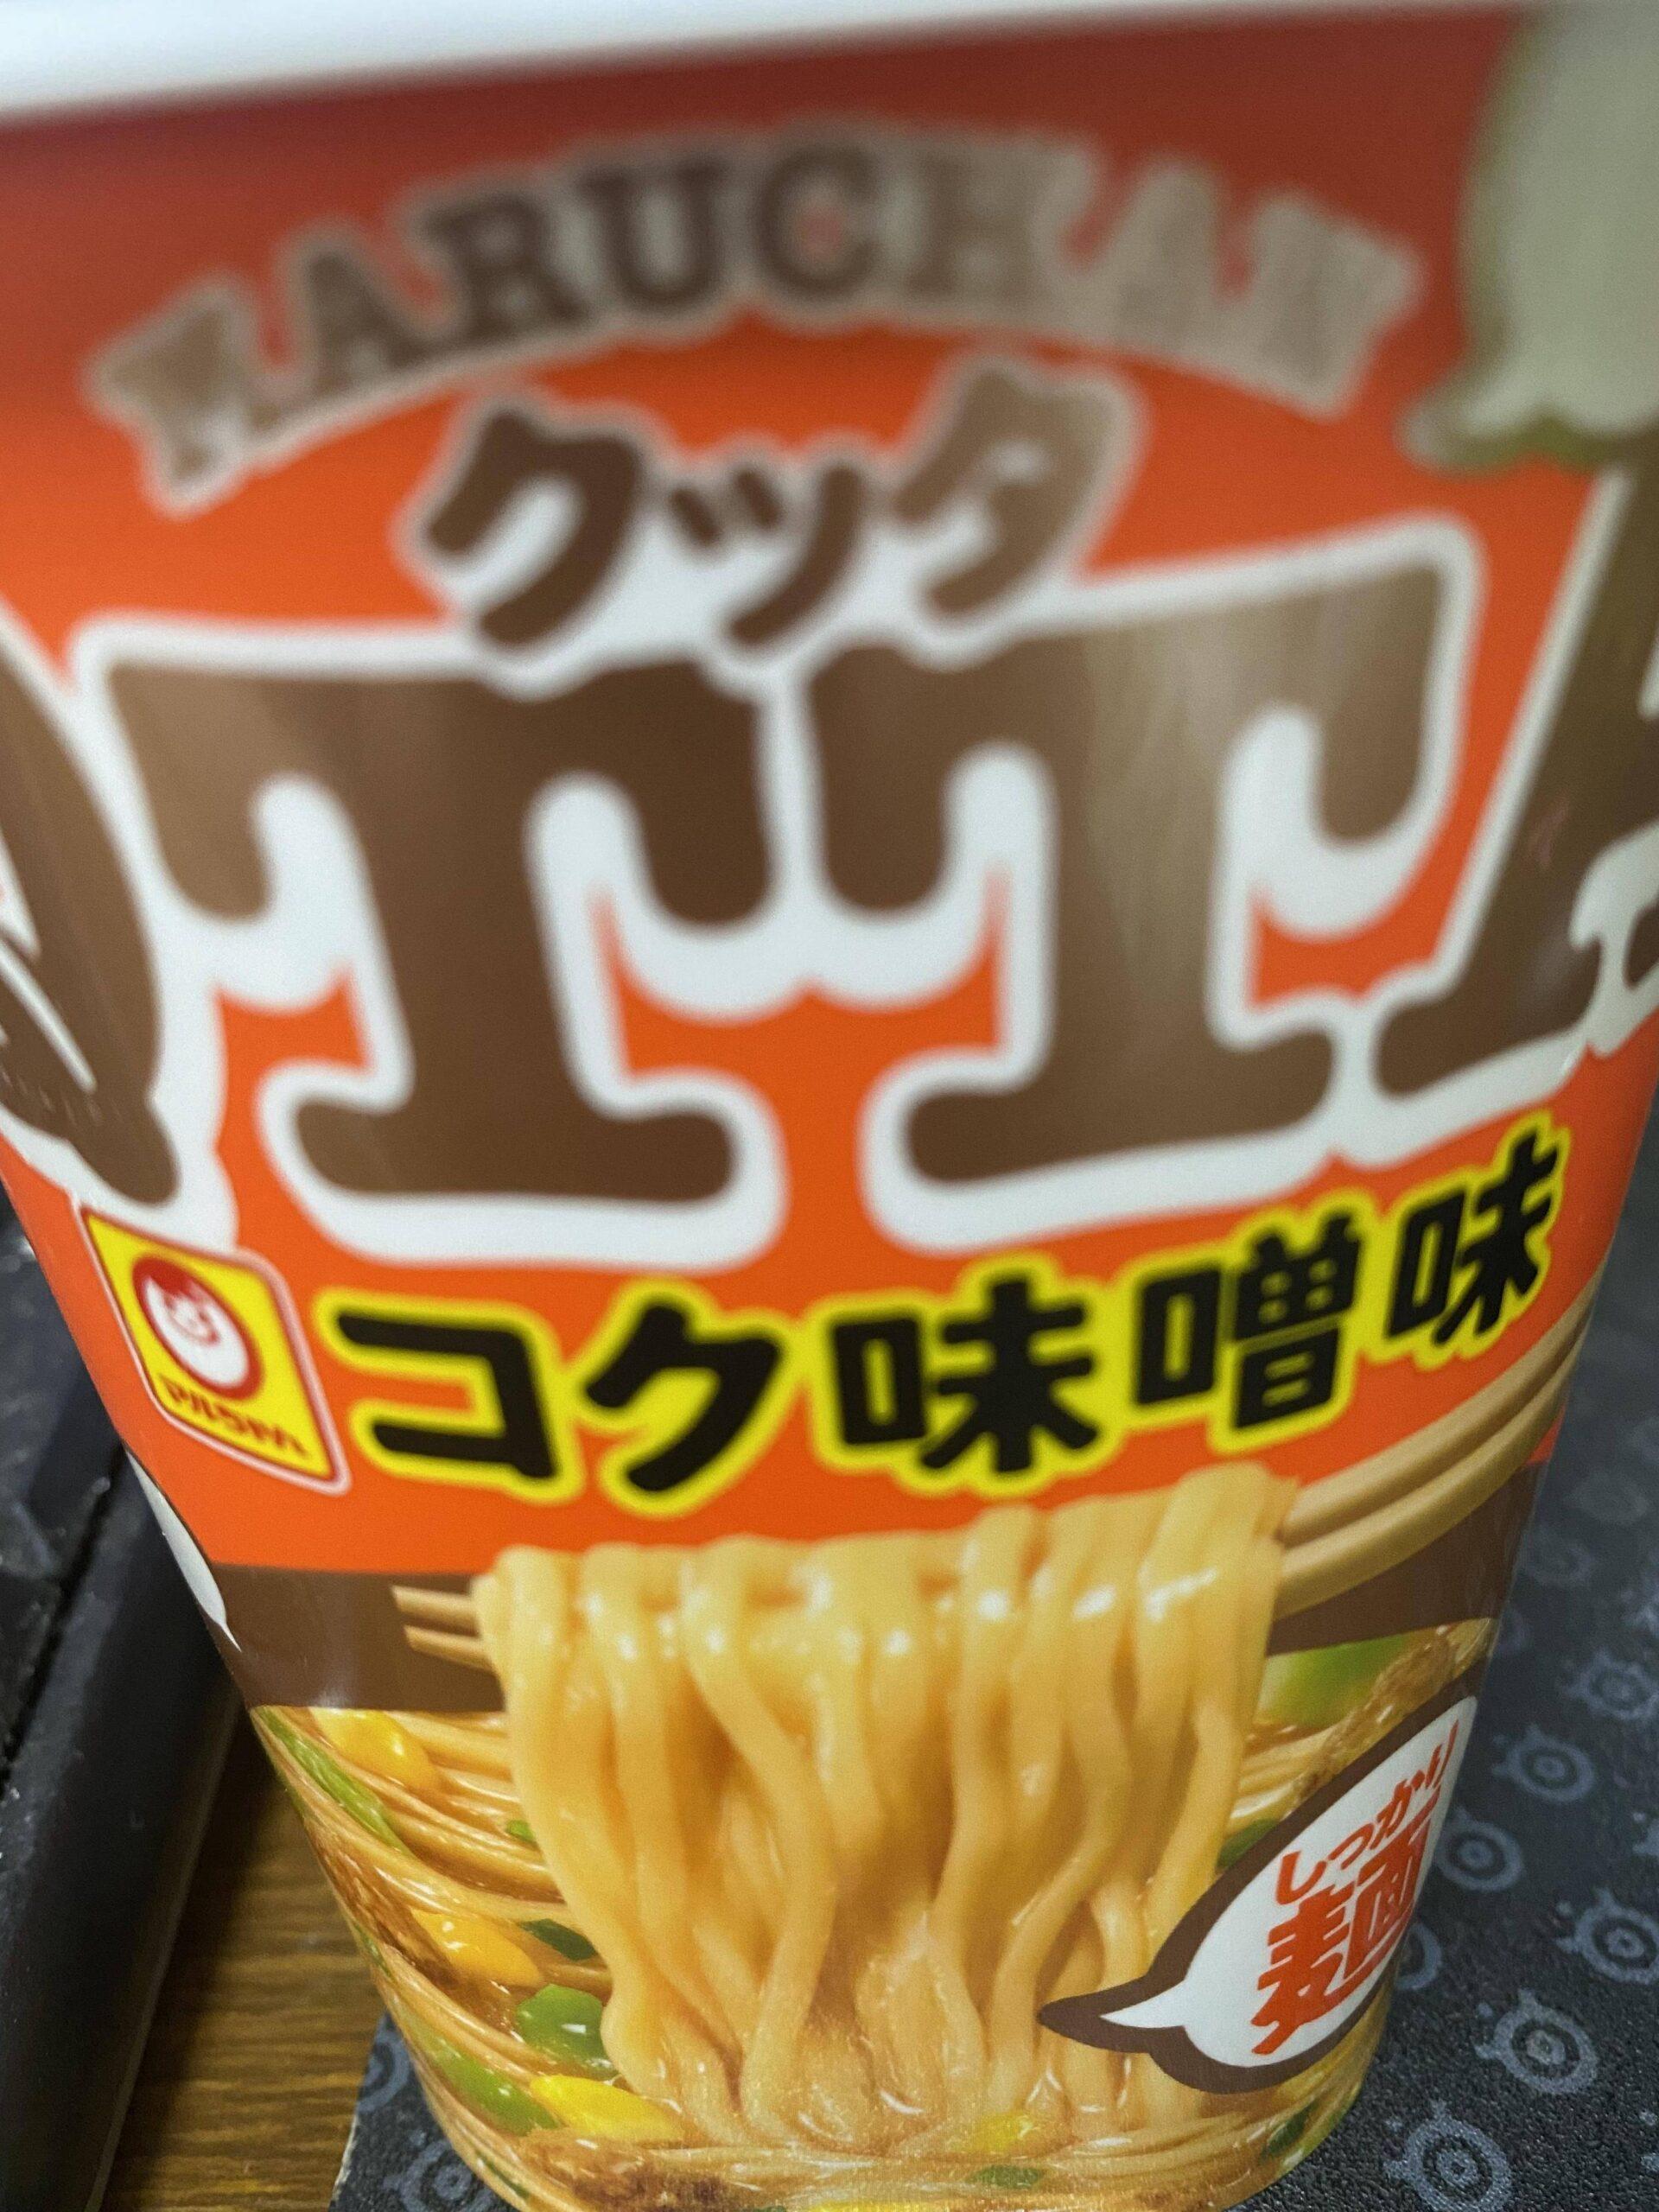 【画像】新しいカップ麺食うぞwwwwwwwwwwwwwwwwww